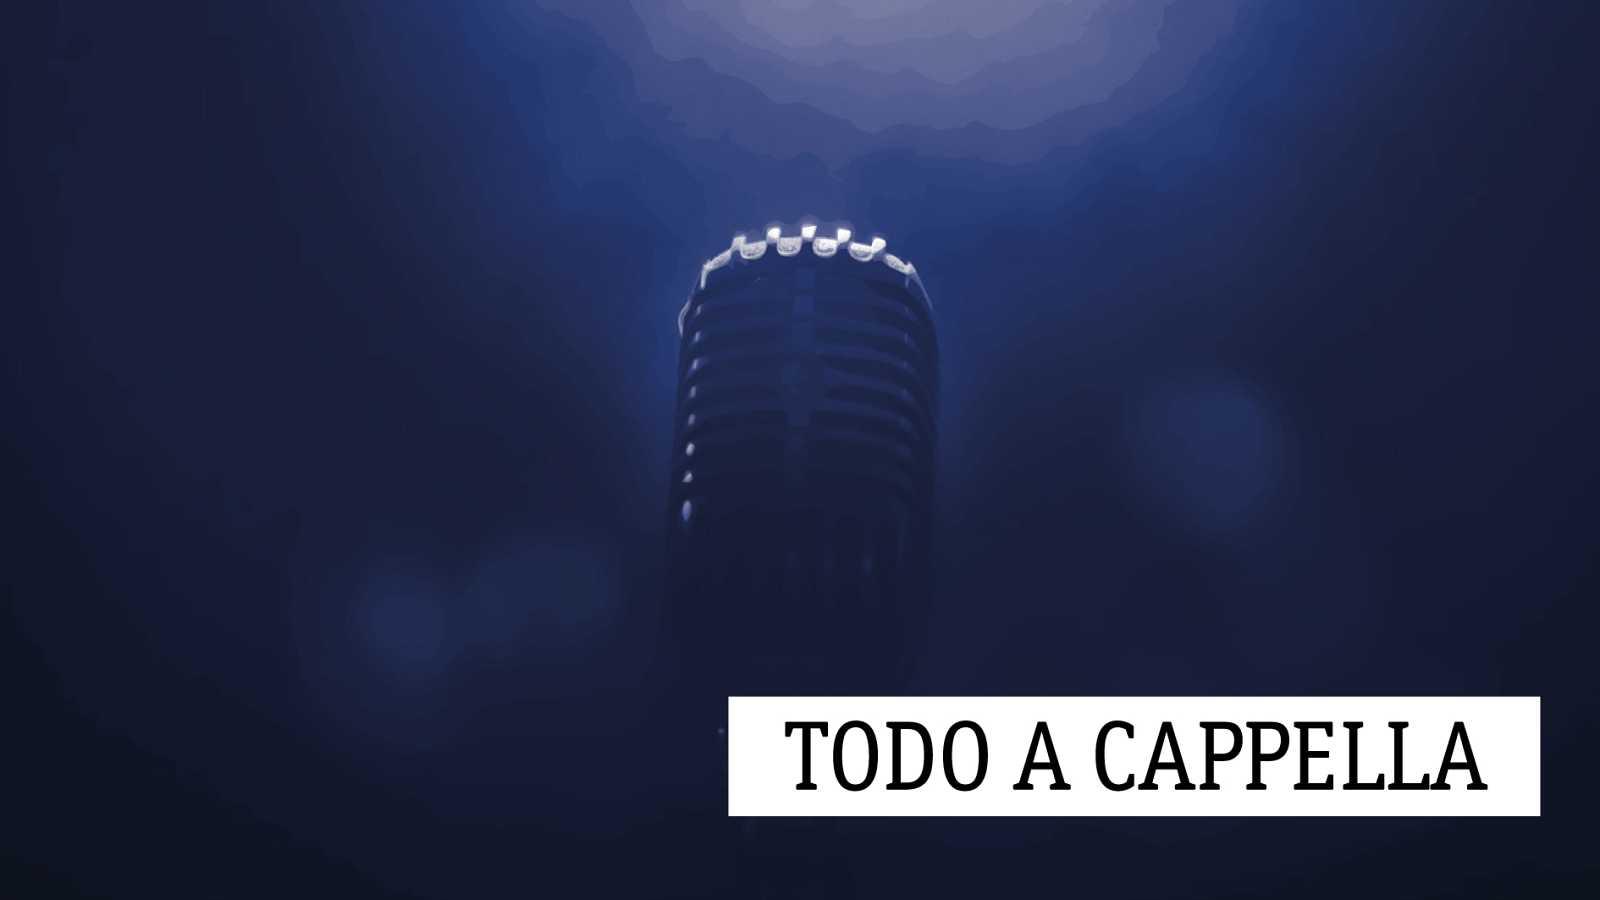 Todo a cappella - Dios esté en mi cabeza - 29/09/19 - escuchar ahora